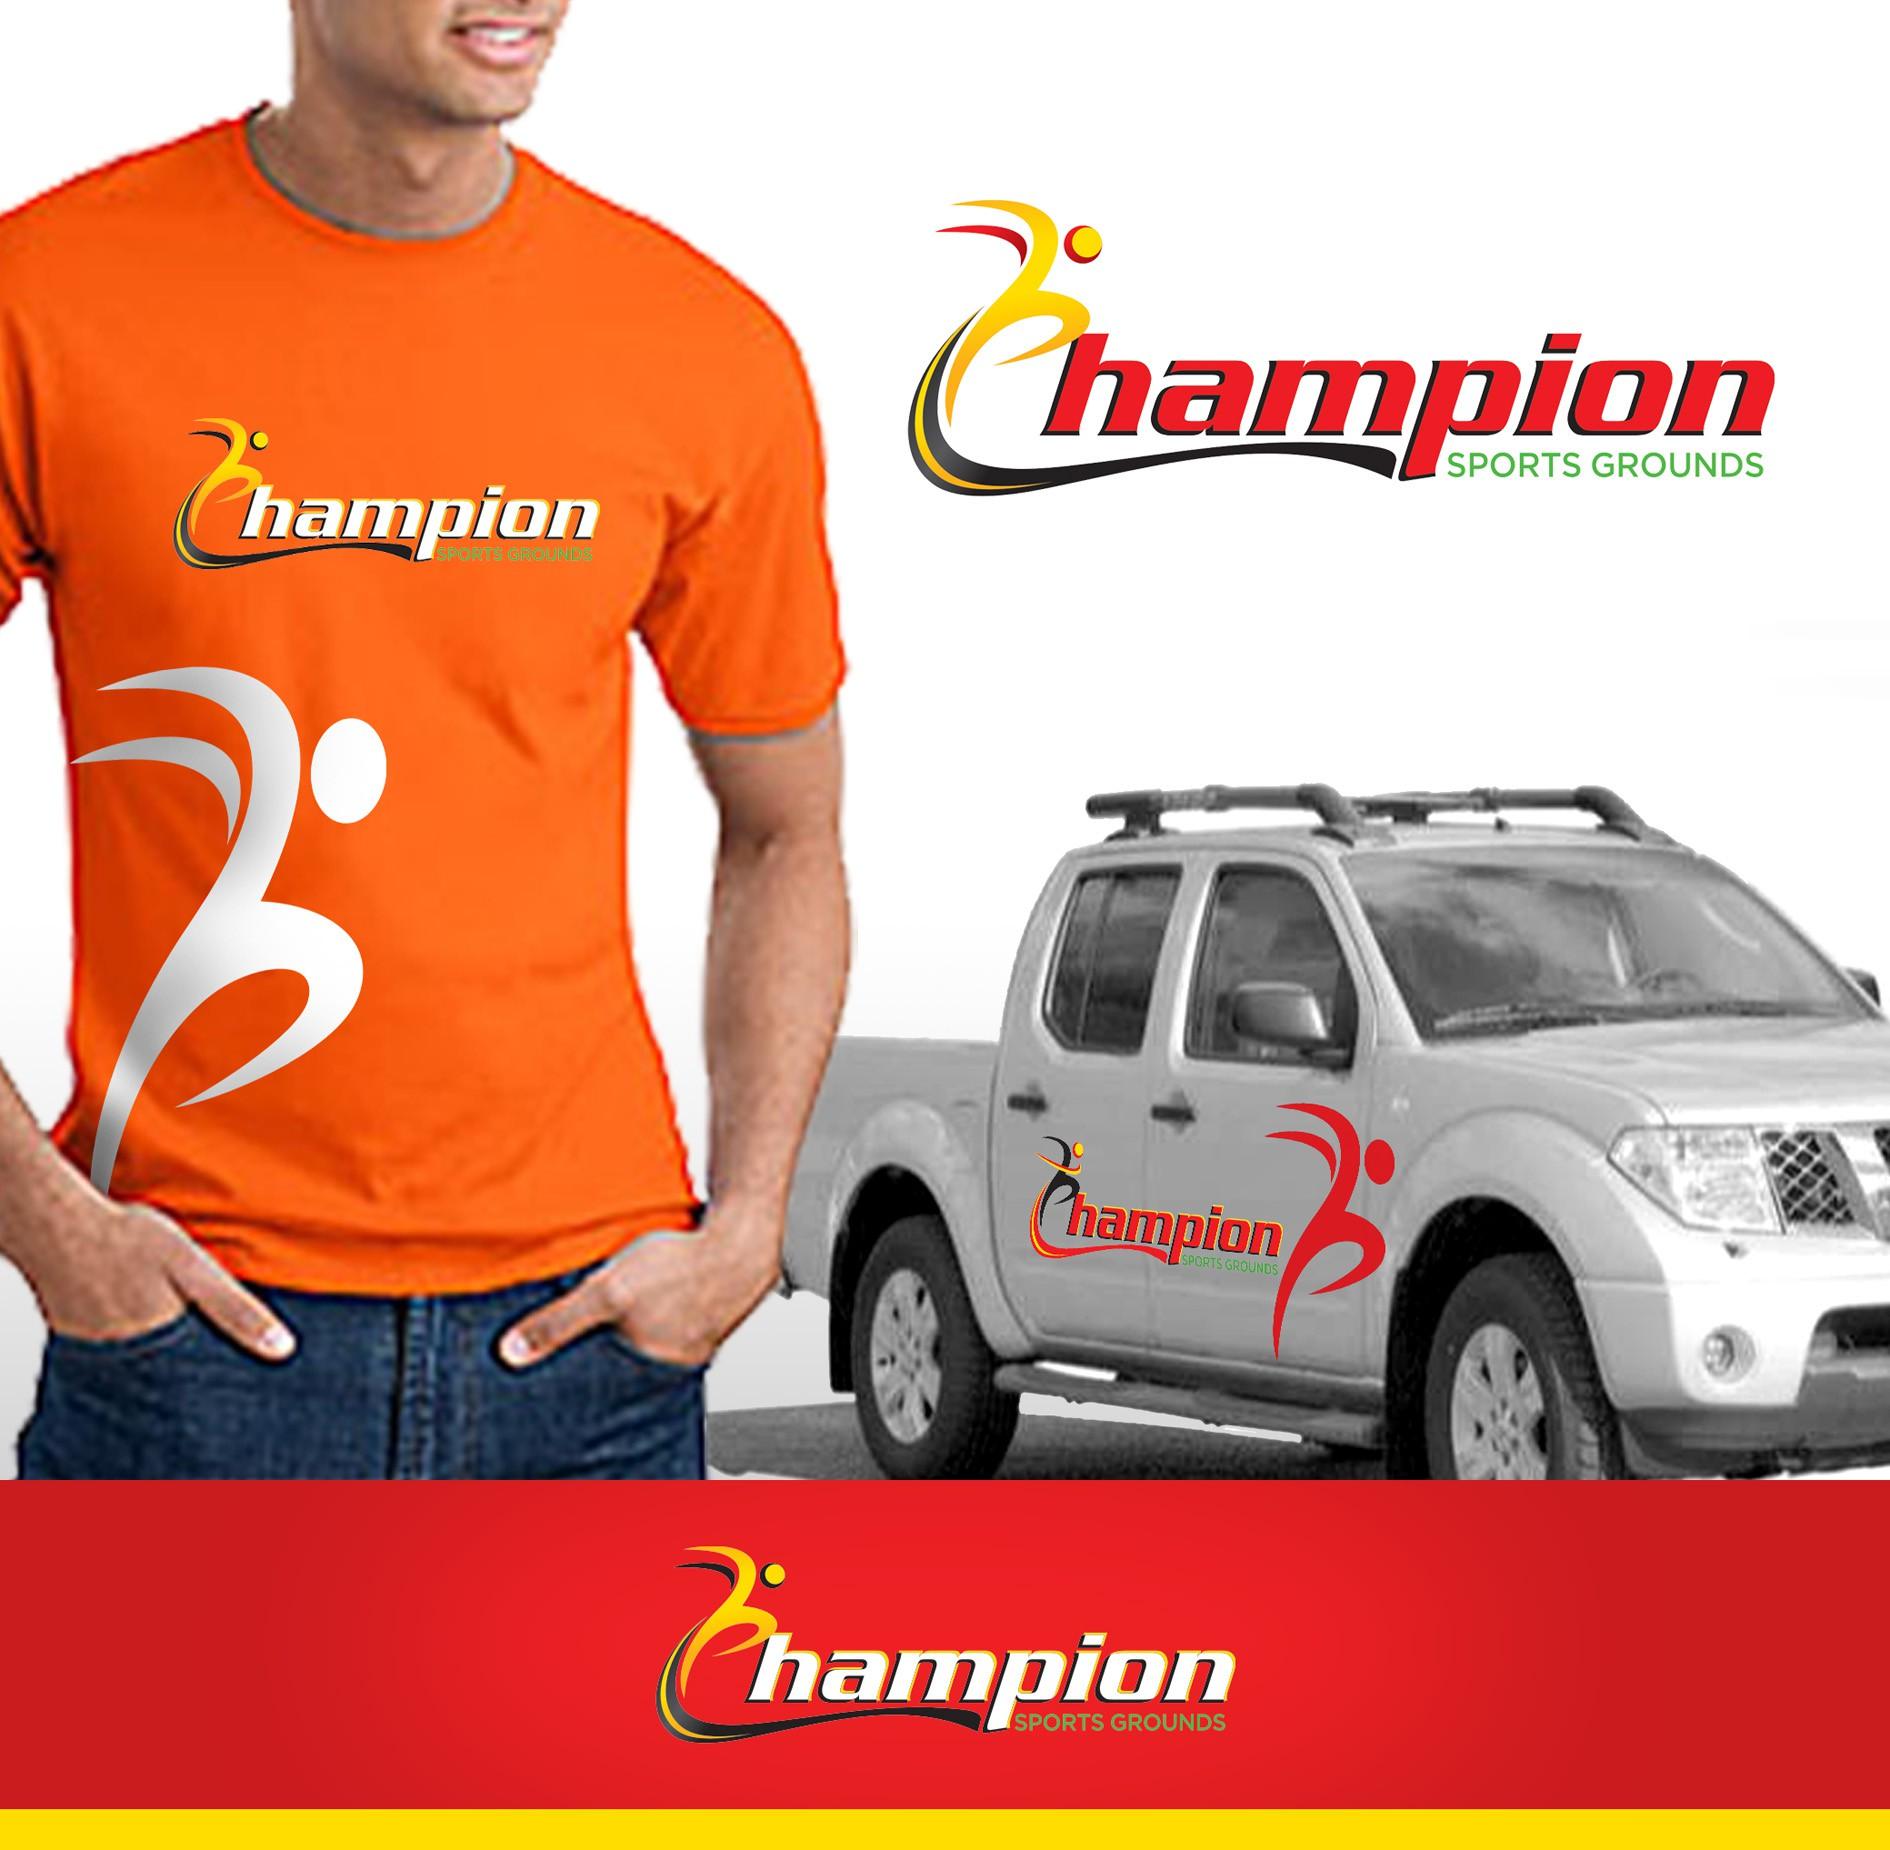 Champion Sports Grounds